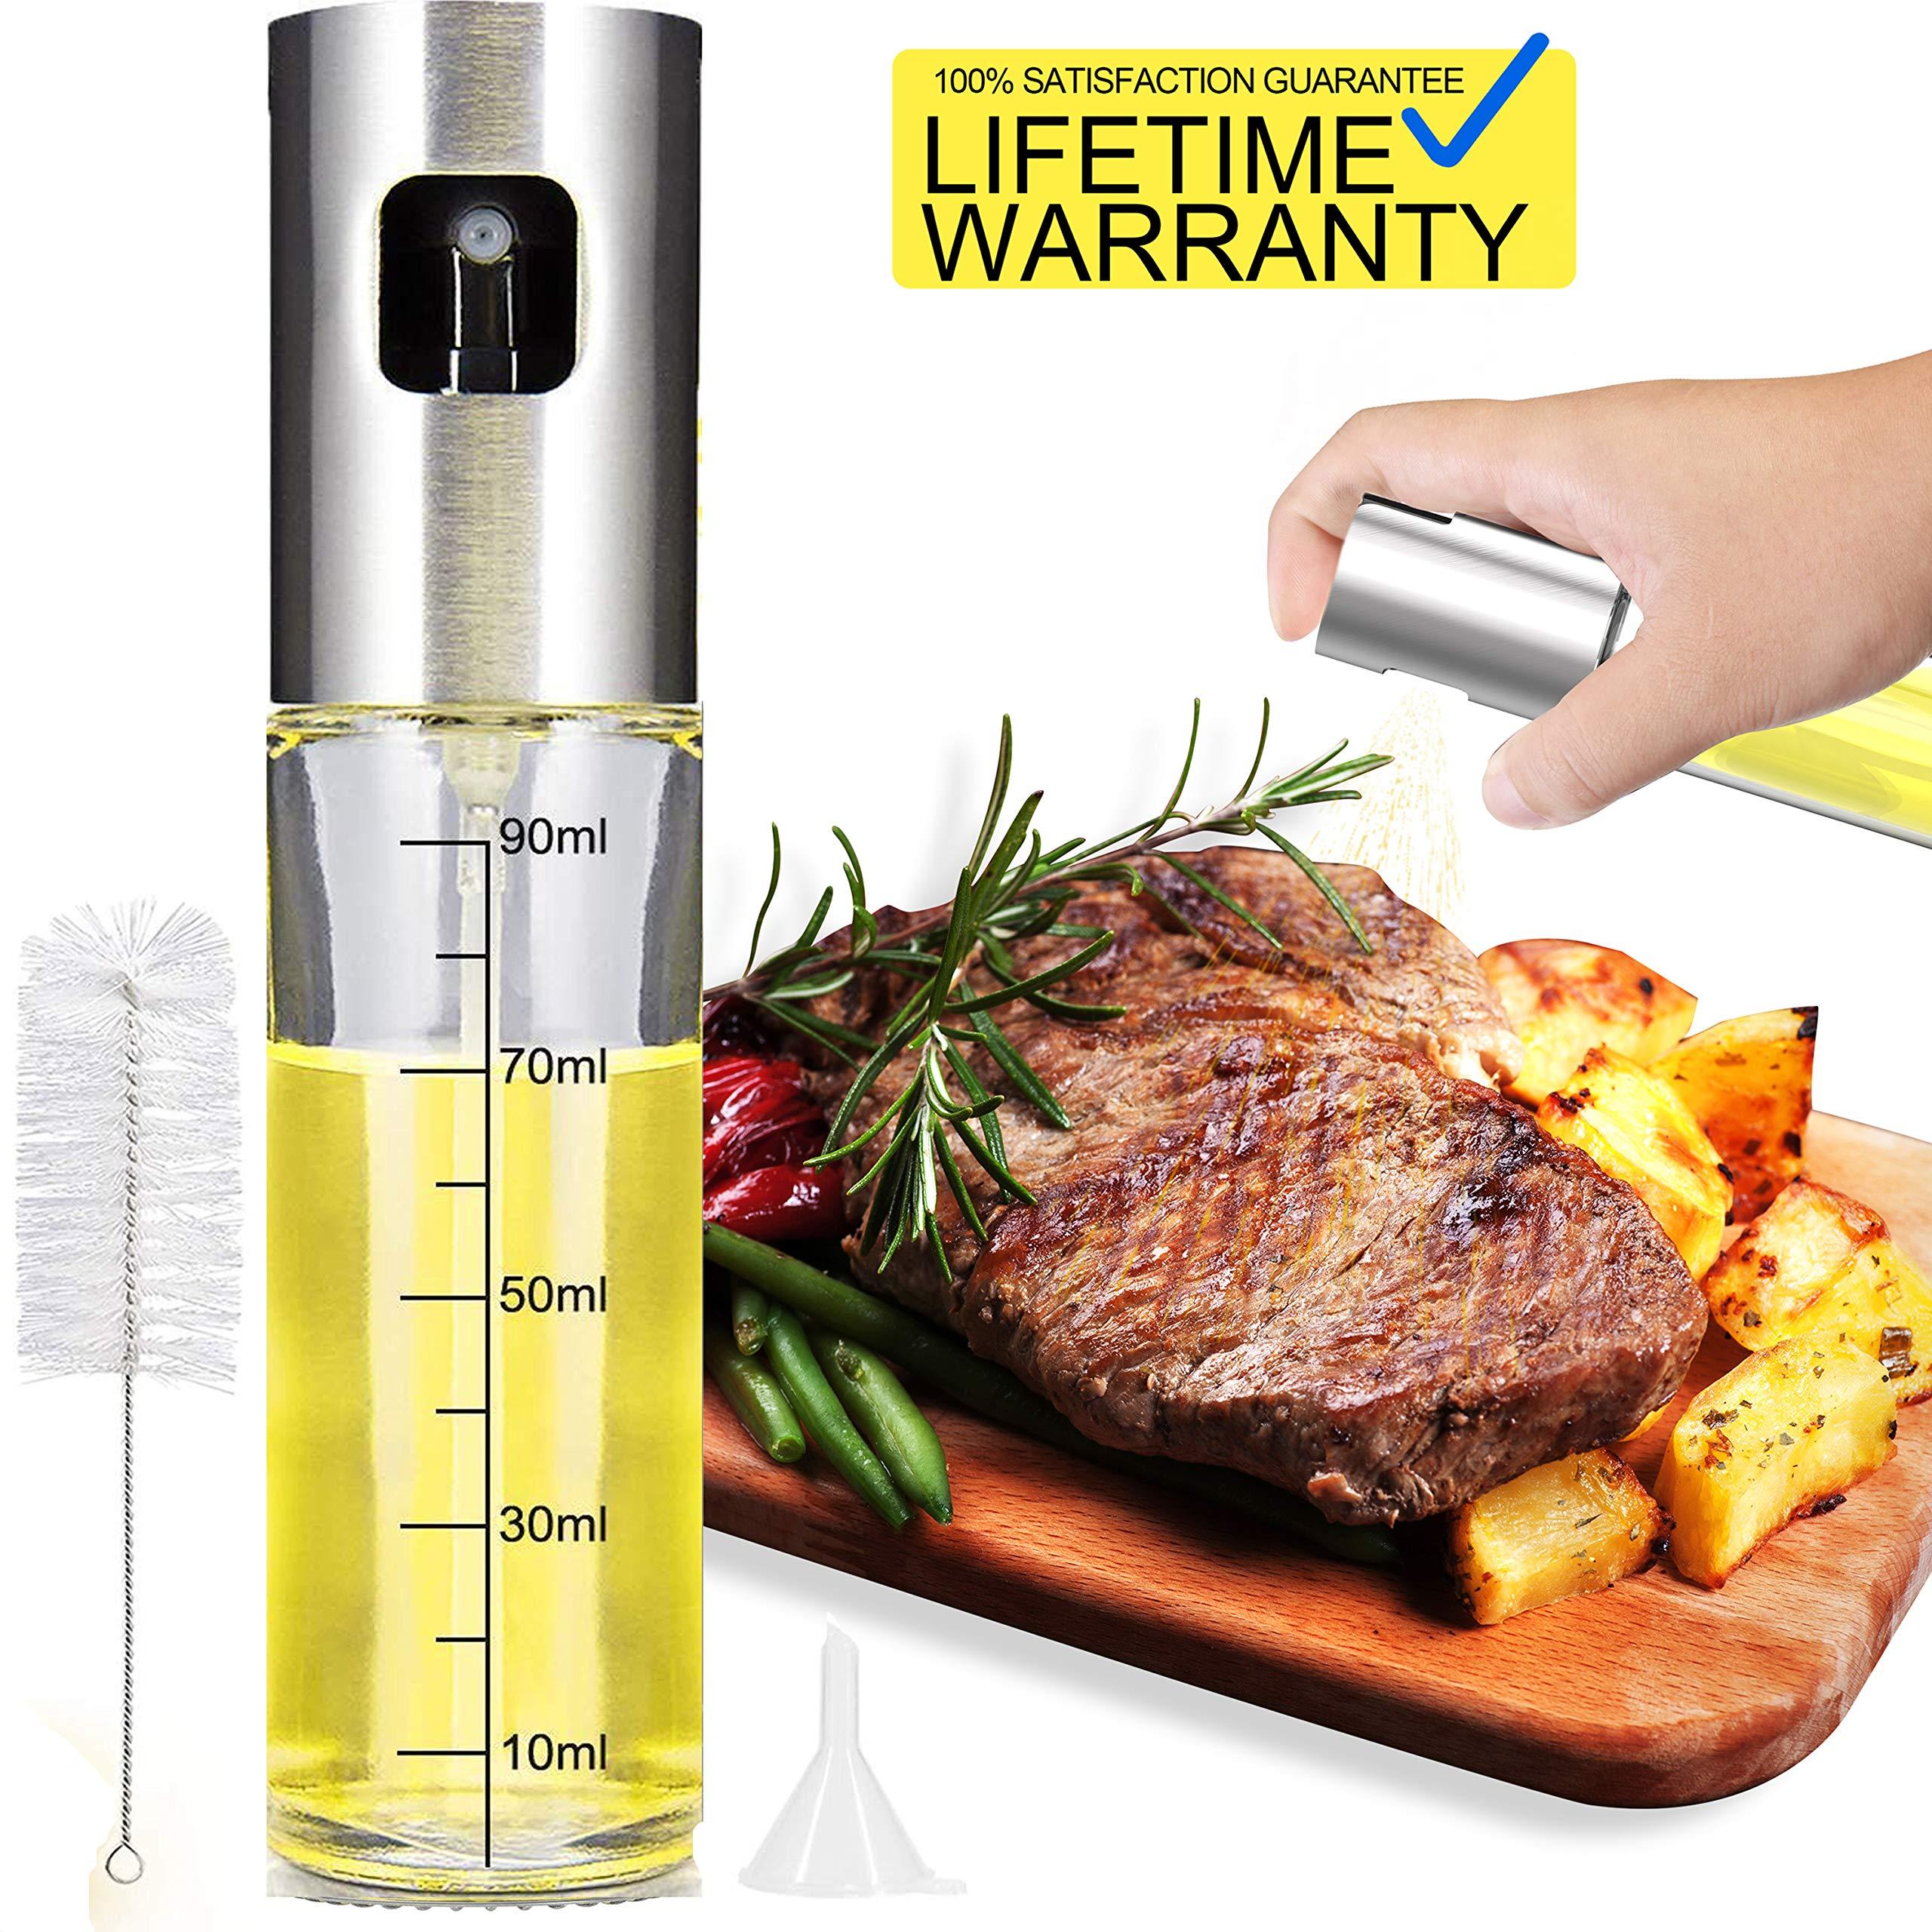 Updated 2020 Version Olive Oil Sprayer Dispenser Mister Bottle For Cooking, BBQ and Air Fryer, Premium Glass Oil Vinegar Soy Sauce Spray for Grilling, Kitchen, Salad, Bread Baking, Frying (2 in 1)